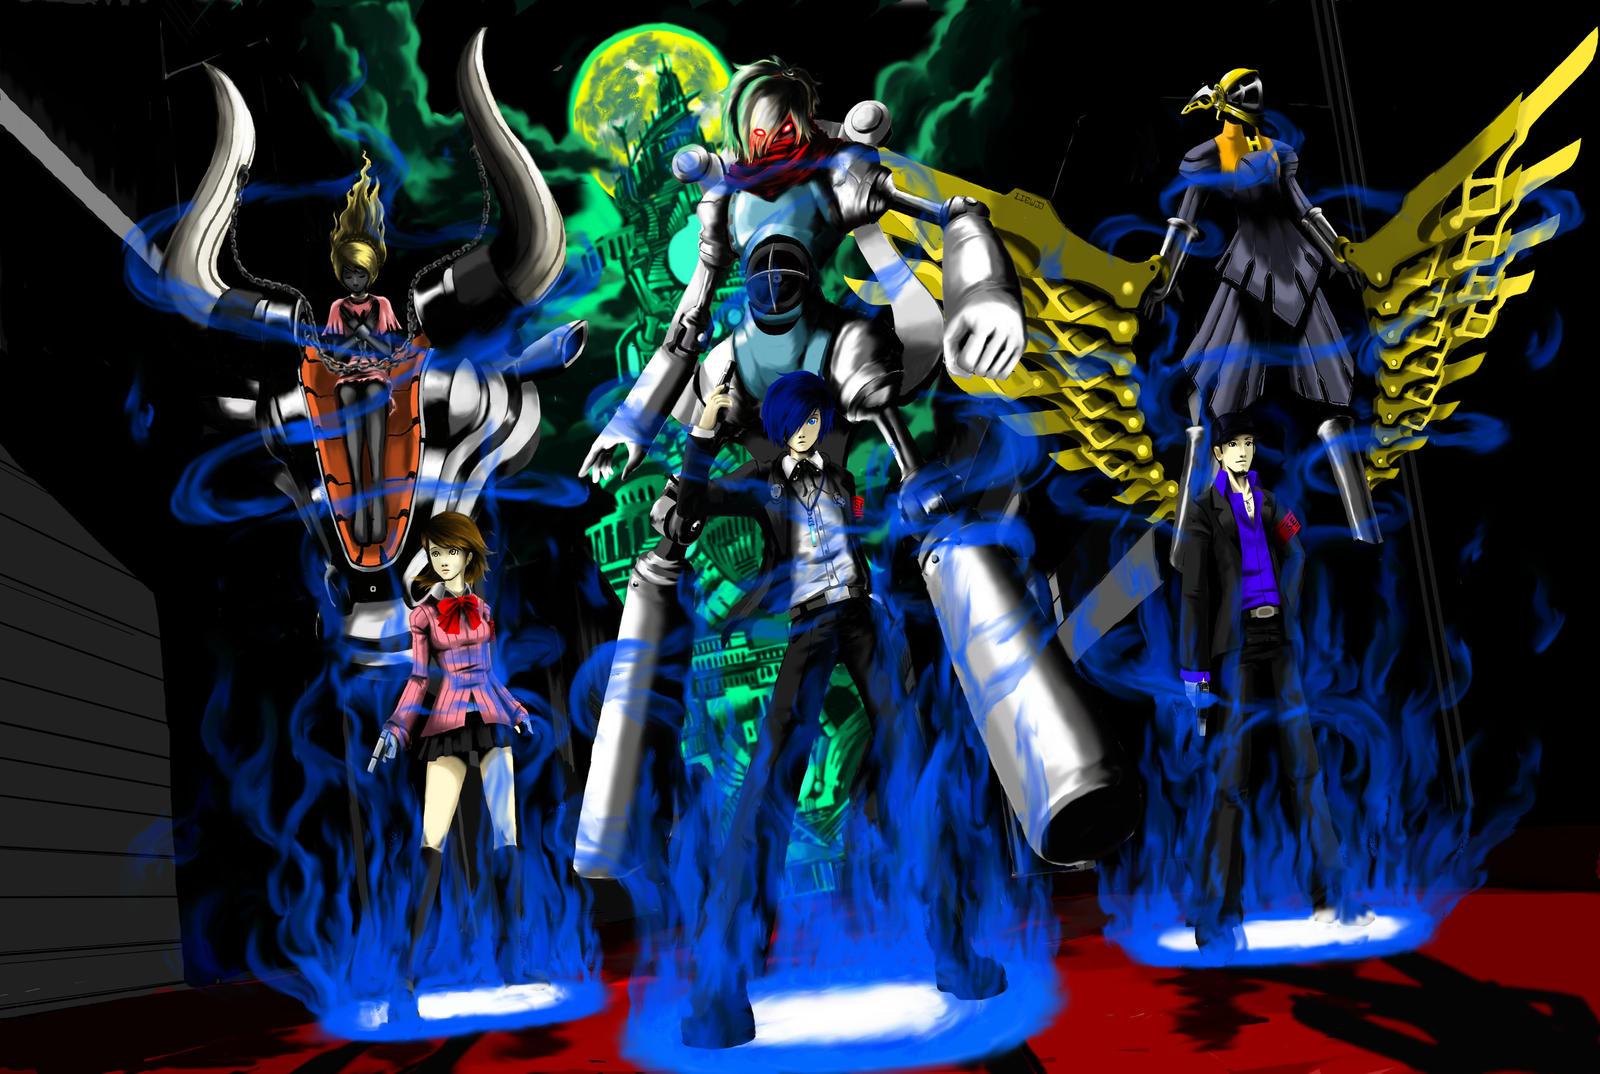 Persona 3: First Rookies by LiewJJ